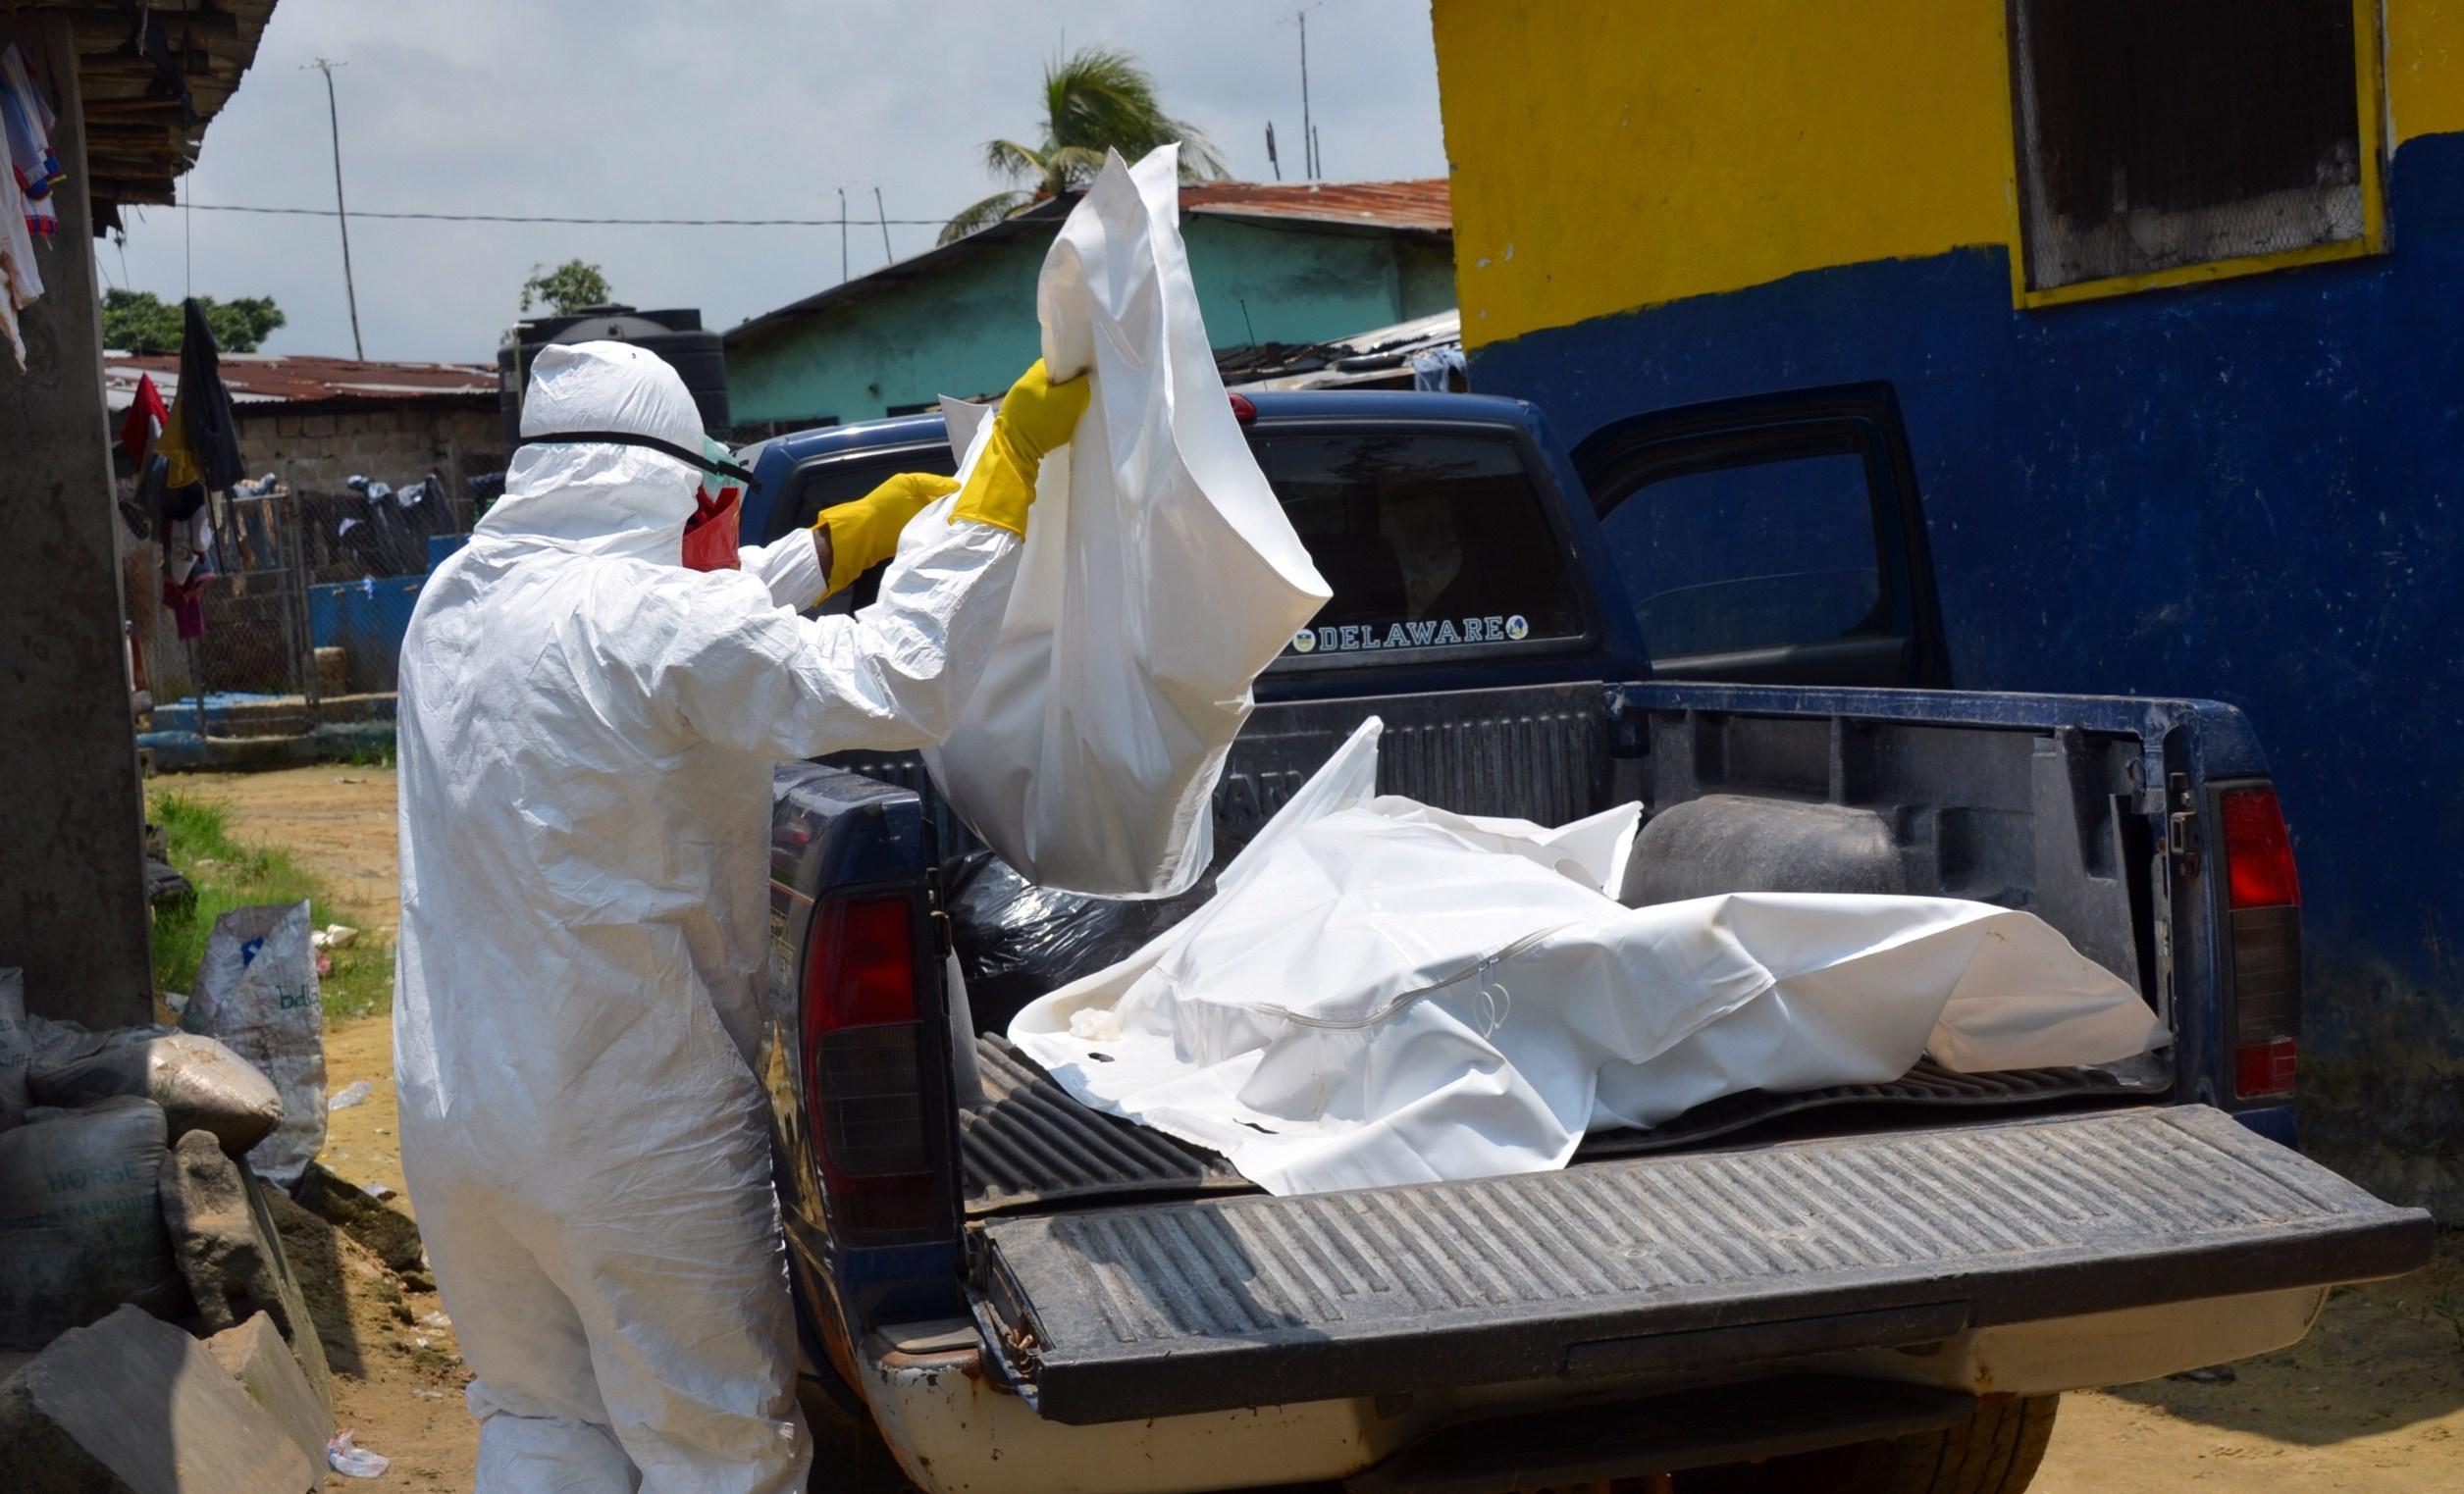 Dritter Ebola-Fall in USA?: Freund der Krankenschwester Nina Pham auch infiziert?